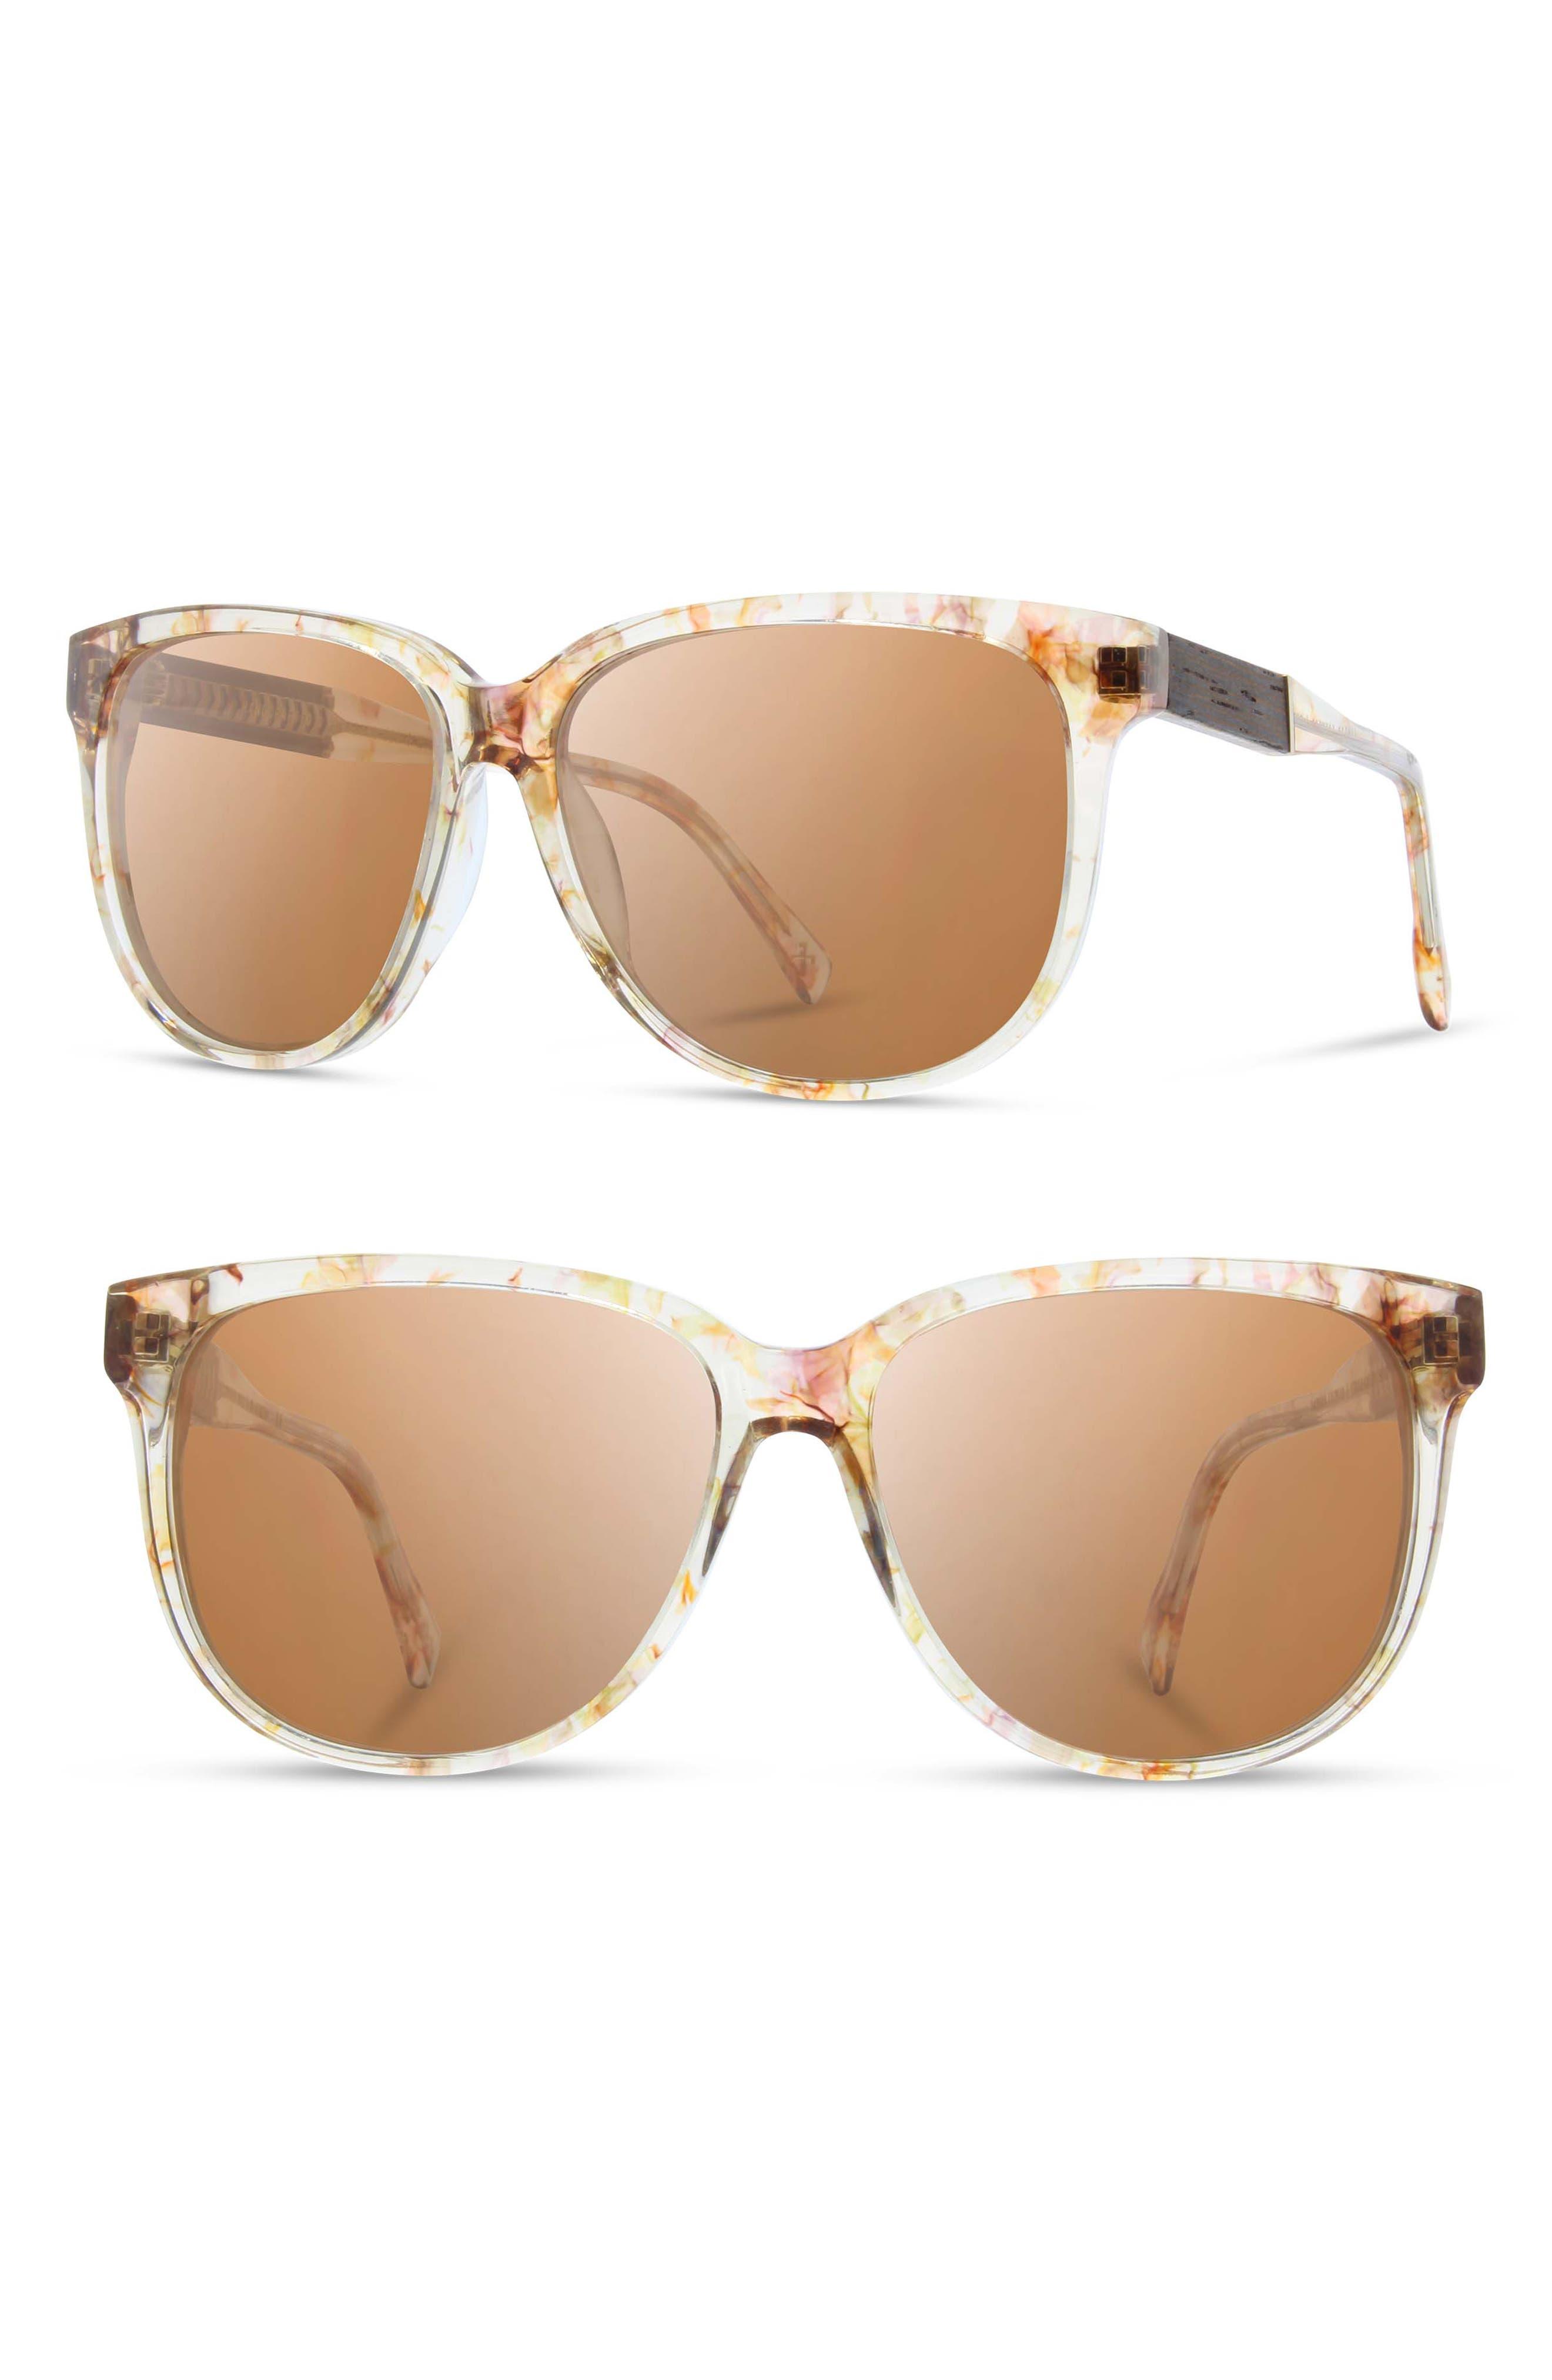 'McKenzie' 57mm Polarized Sunglasses,                             Main thumbnail 1, color,                             BLOSSOM/ EBONY/ BROWN